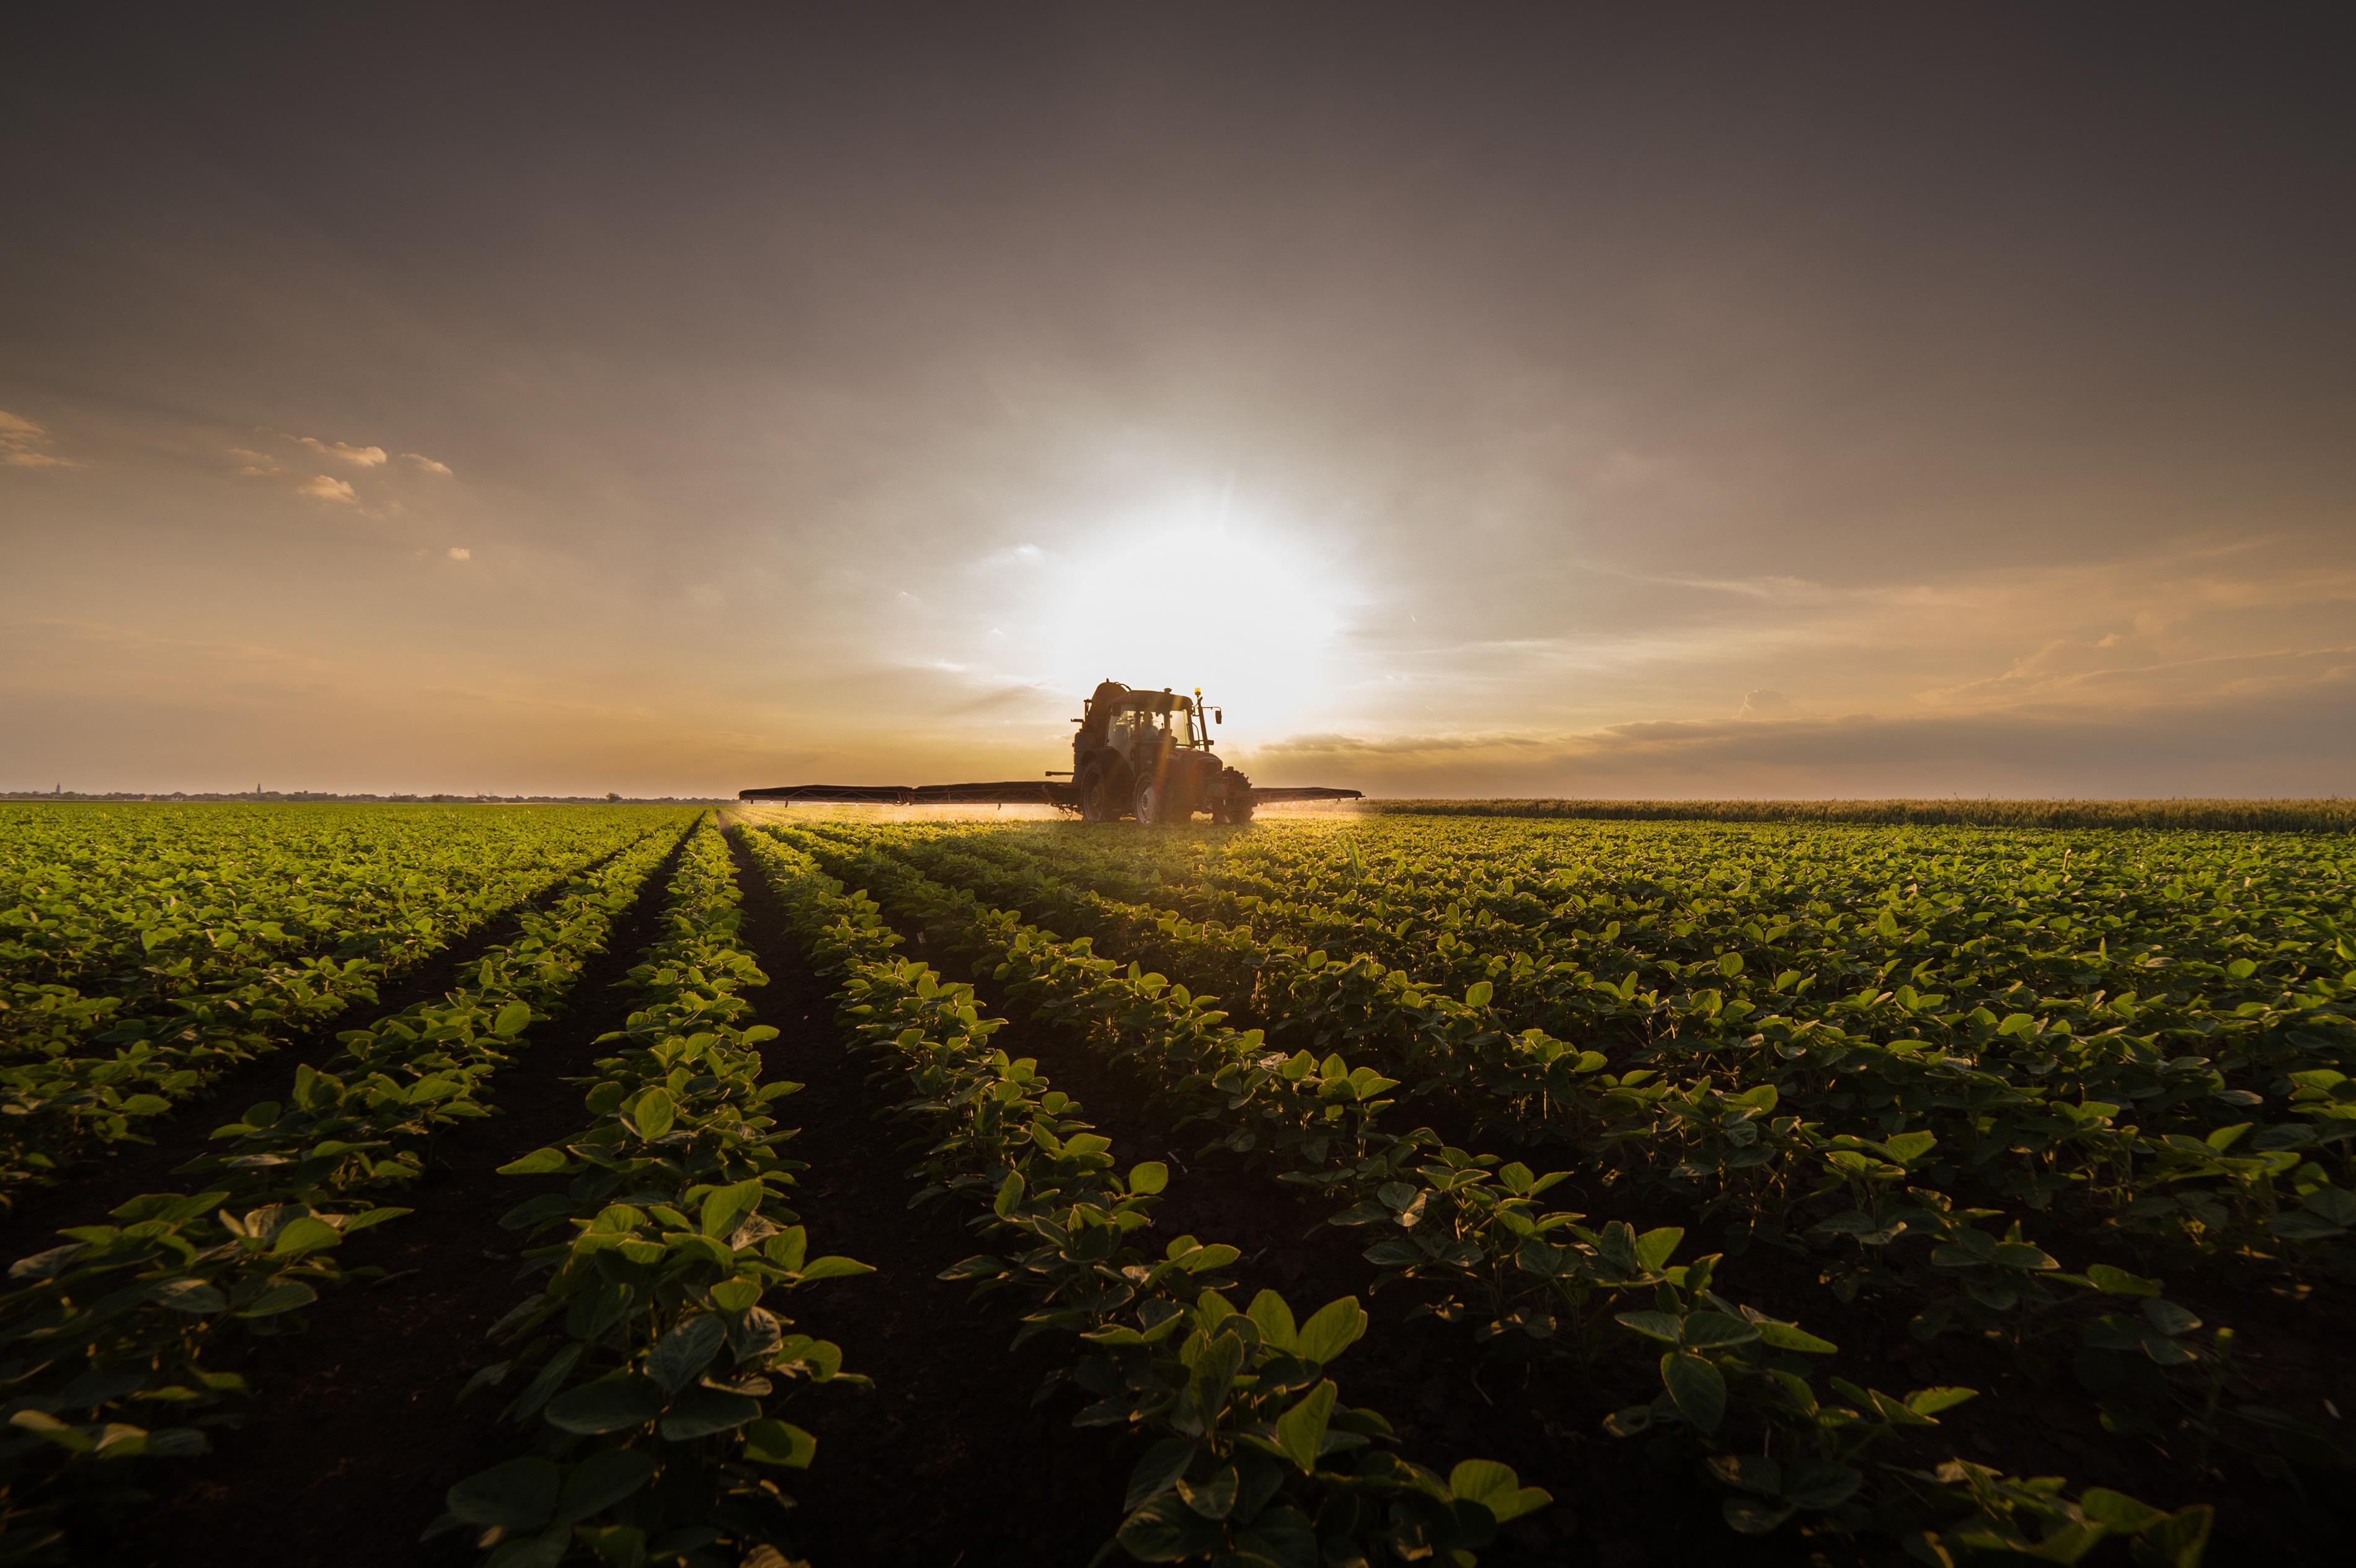 MDA Pesticide Program oversees product, applicator regulations